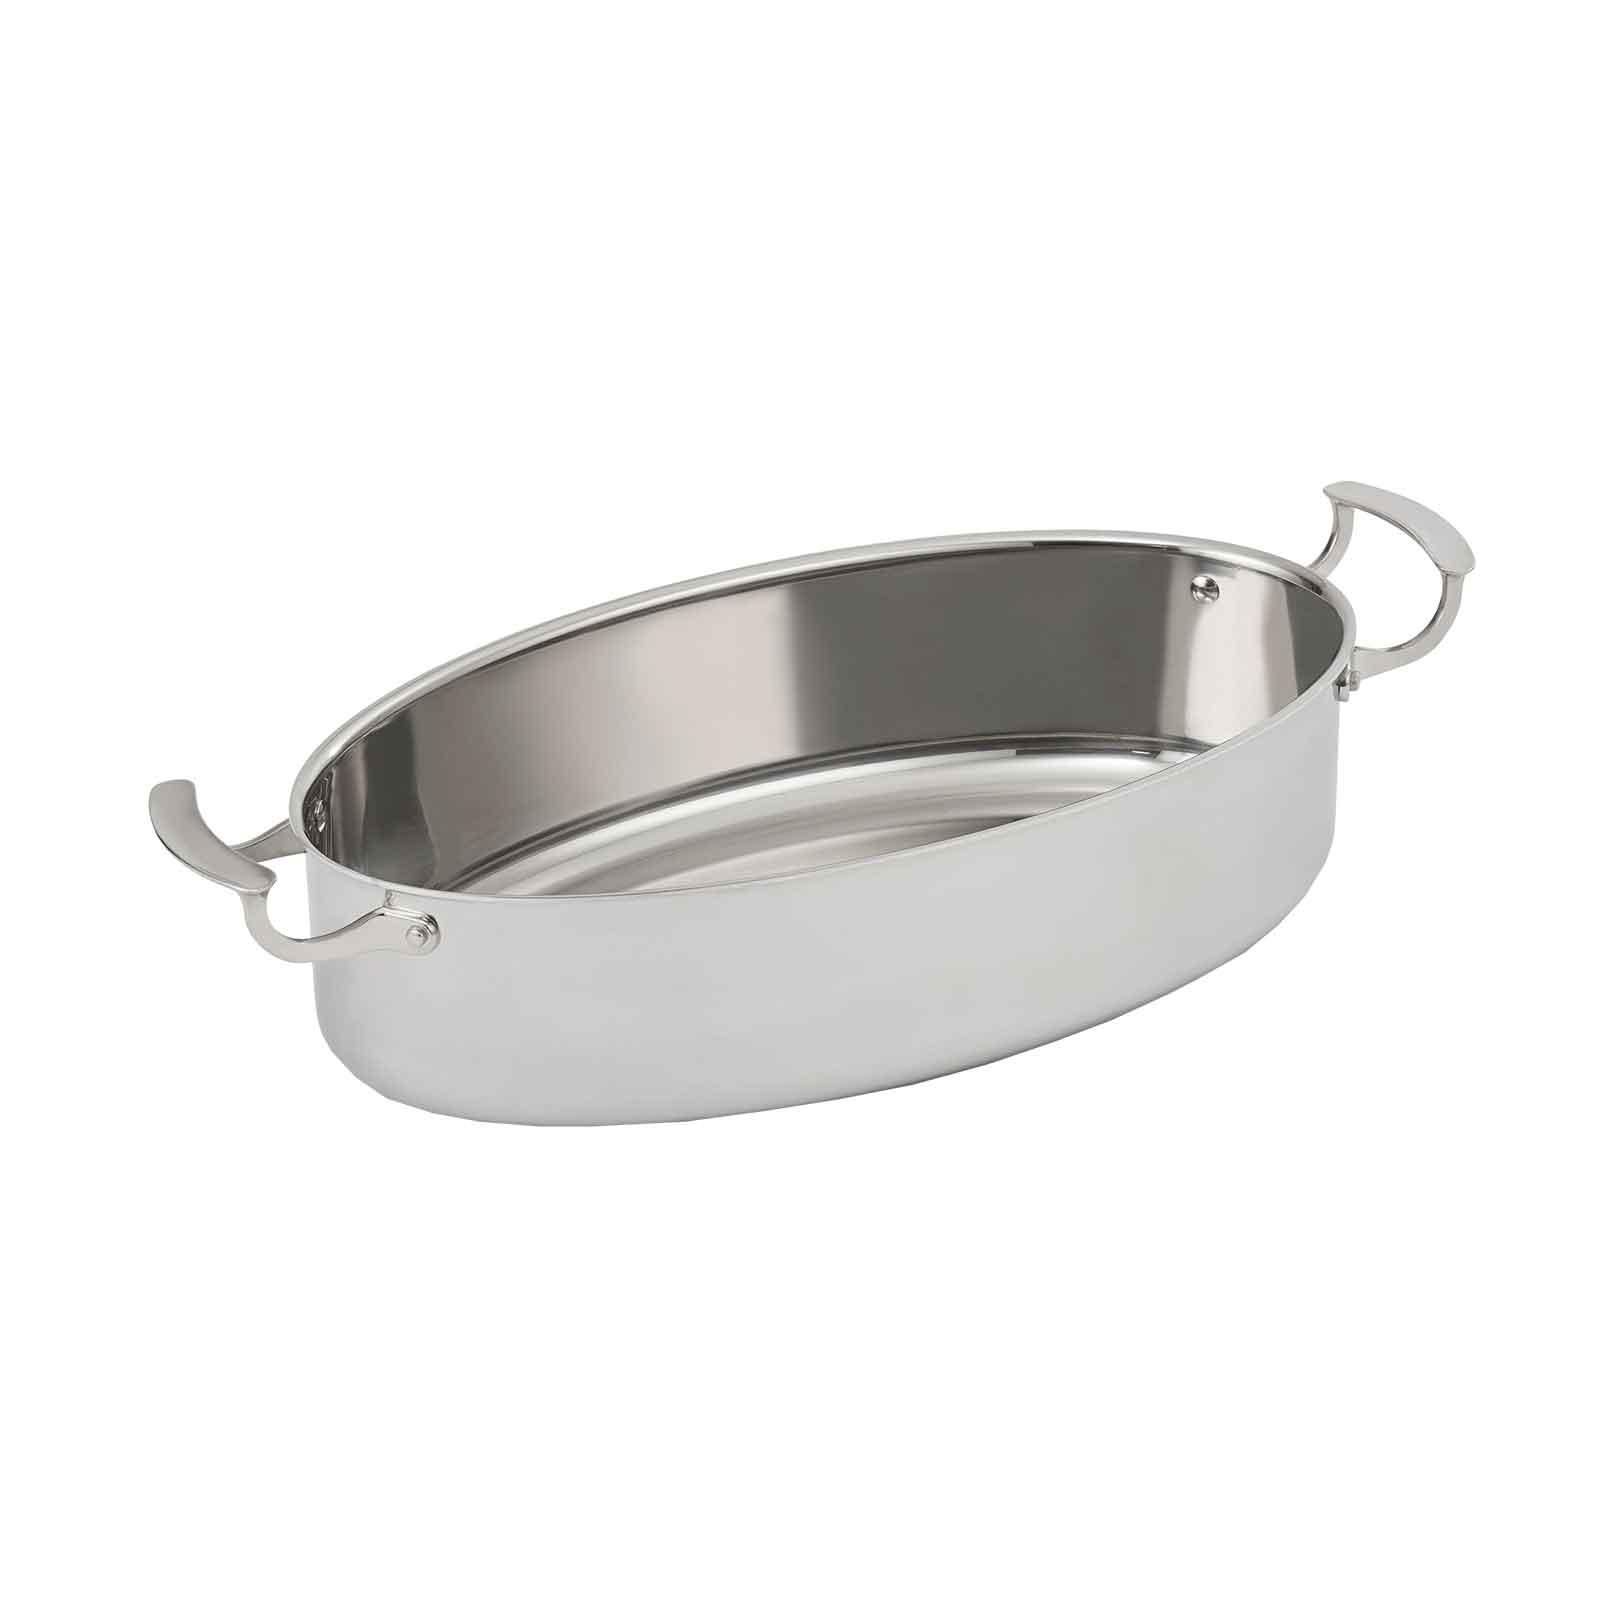 Vollrath 49445 au gratin pan